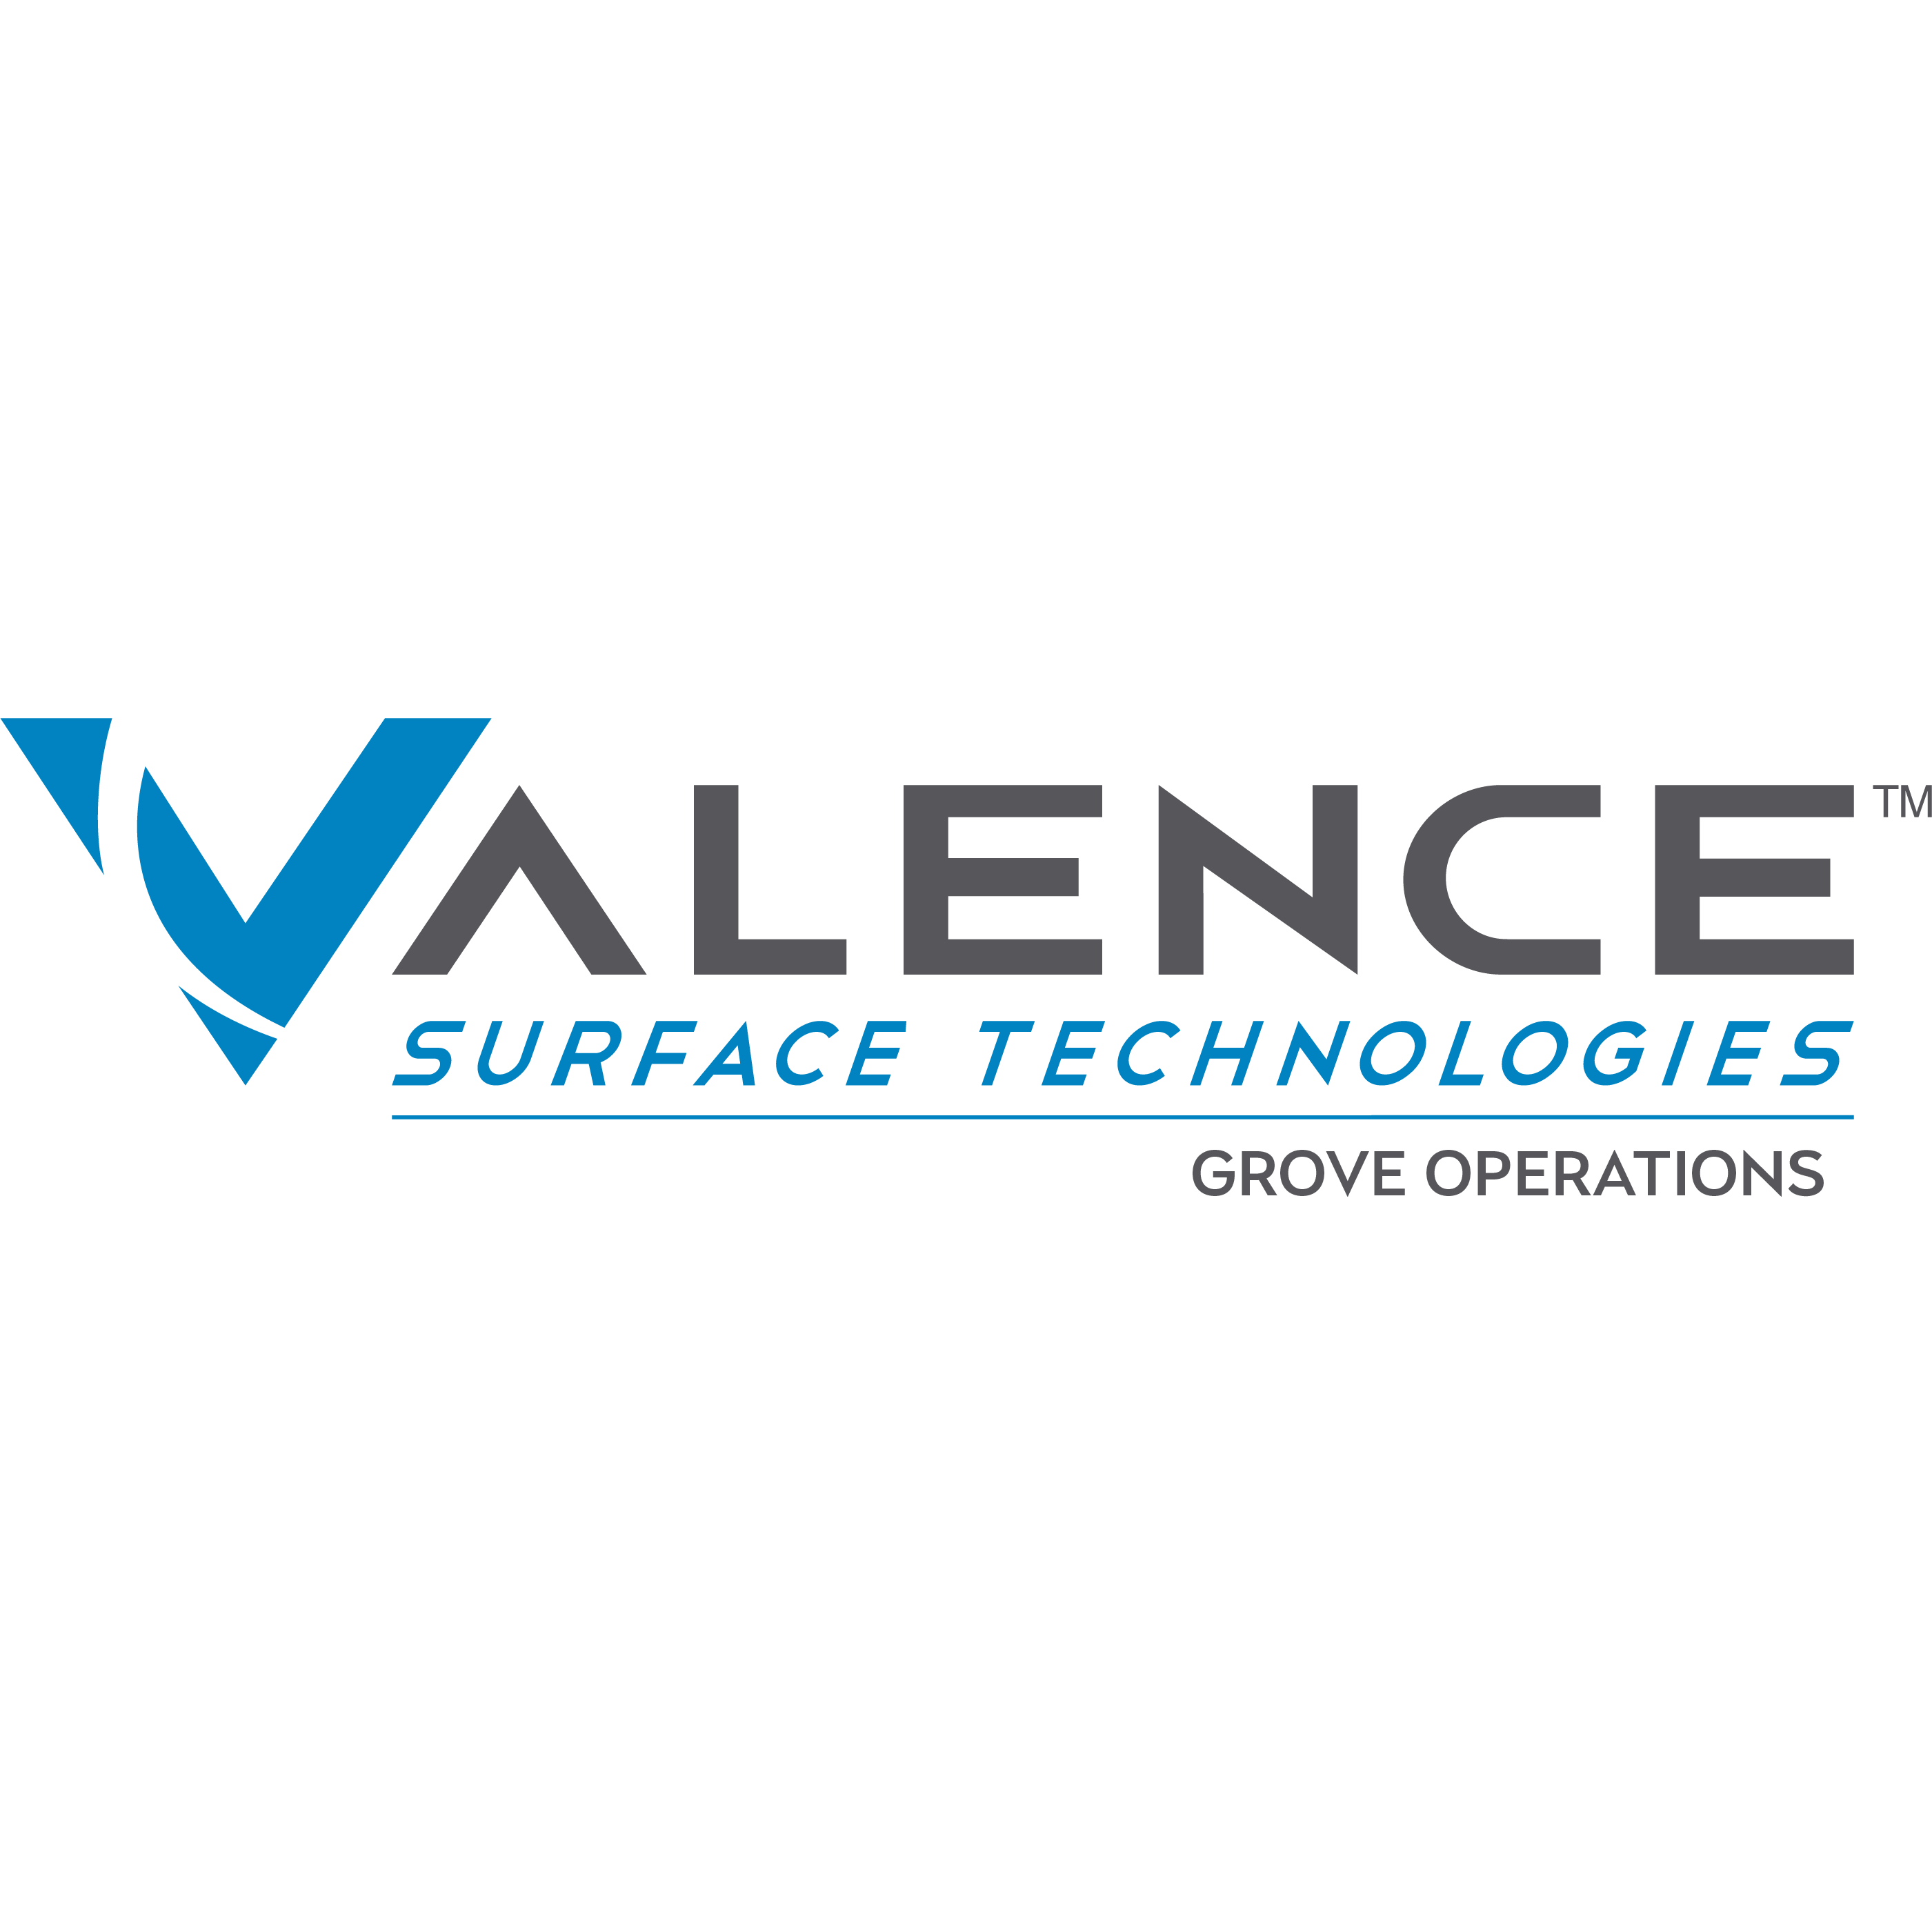 Valence Surface Technologies - Grove, OK 74344 - (918)786-6111 | ShowMeLocal.com